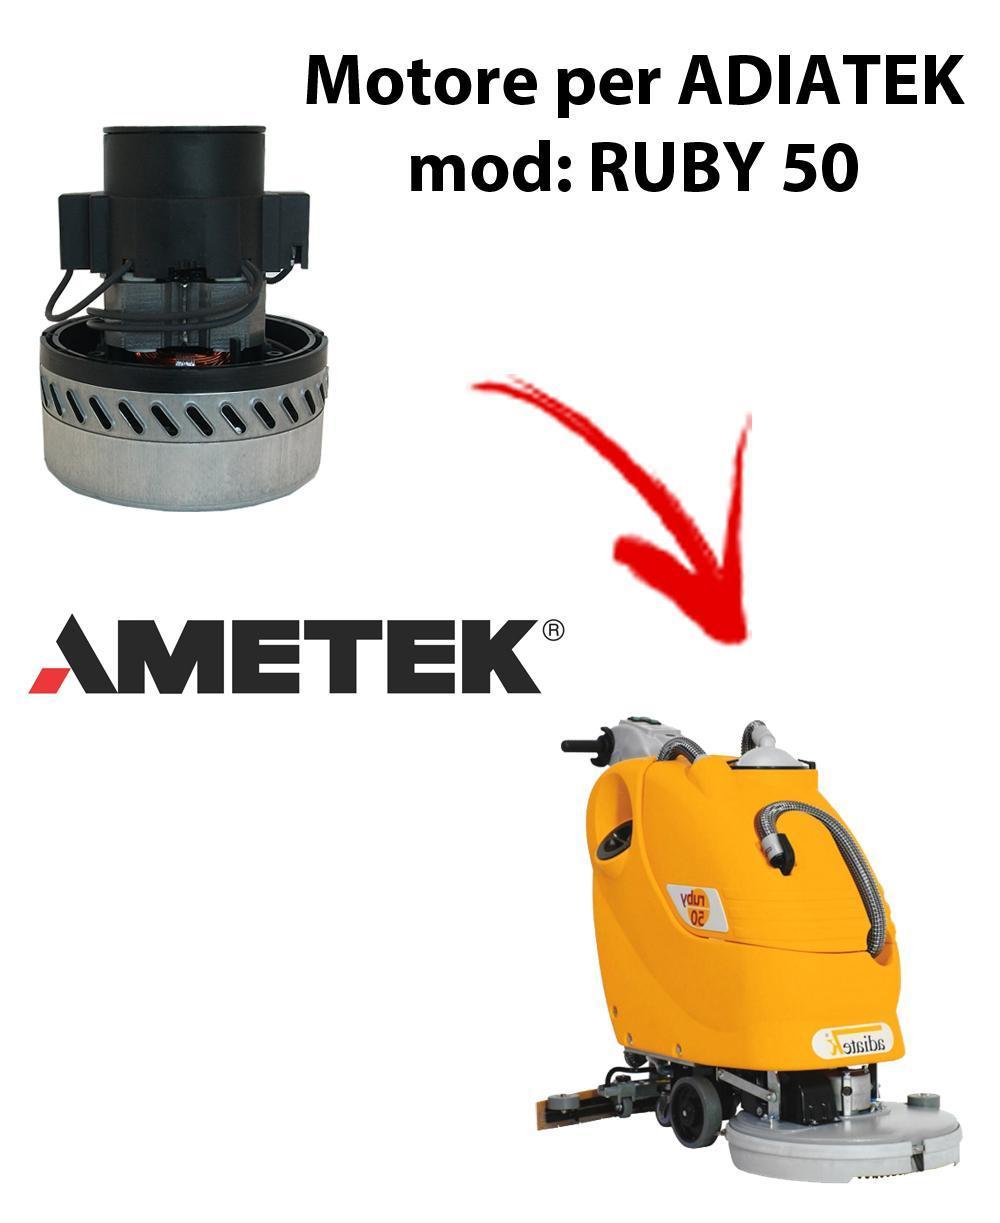 RUBY 50  Motore de aspiración Ametek Italia  para fregadora Adiatek